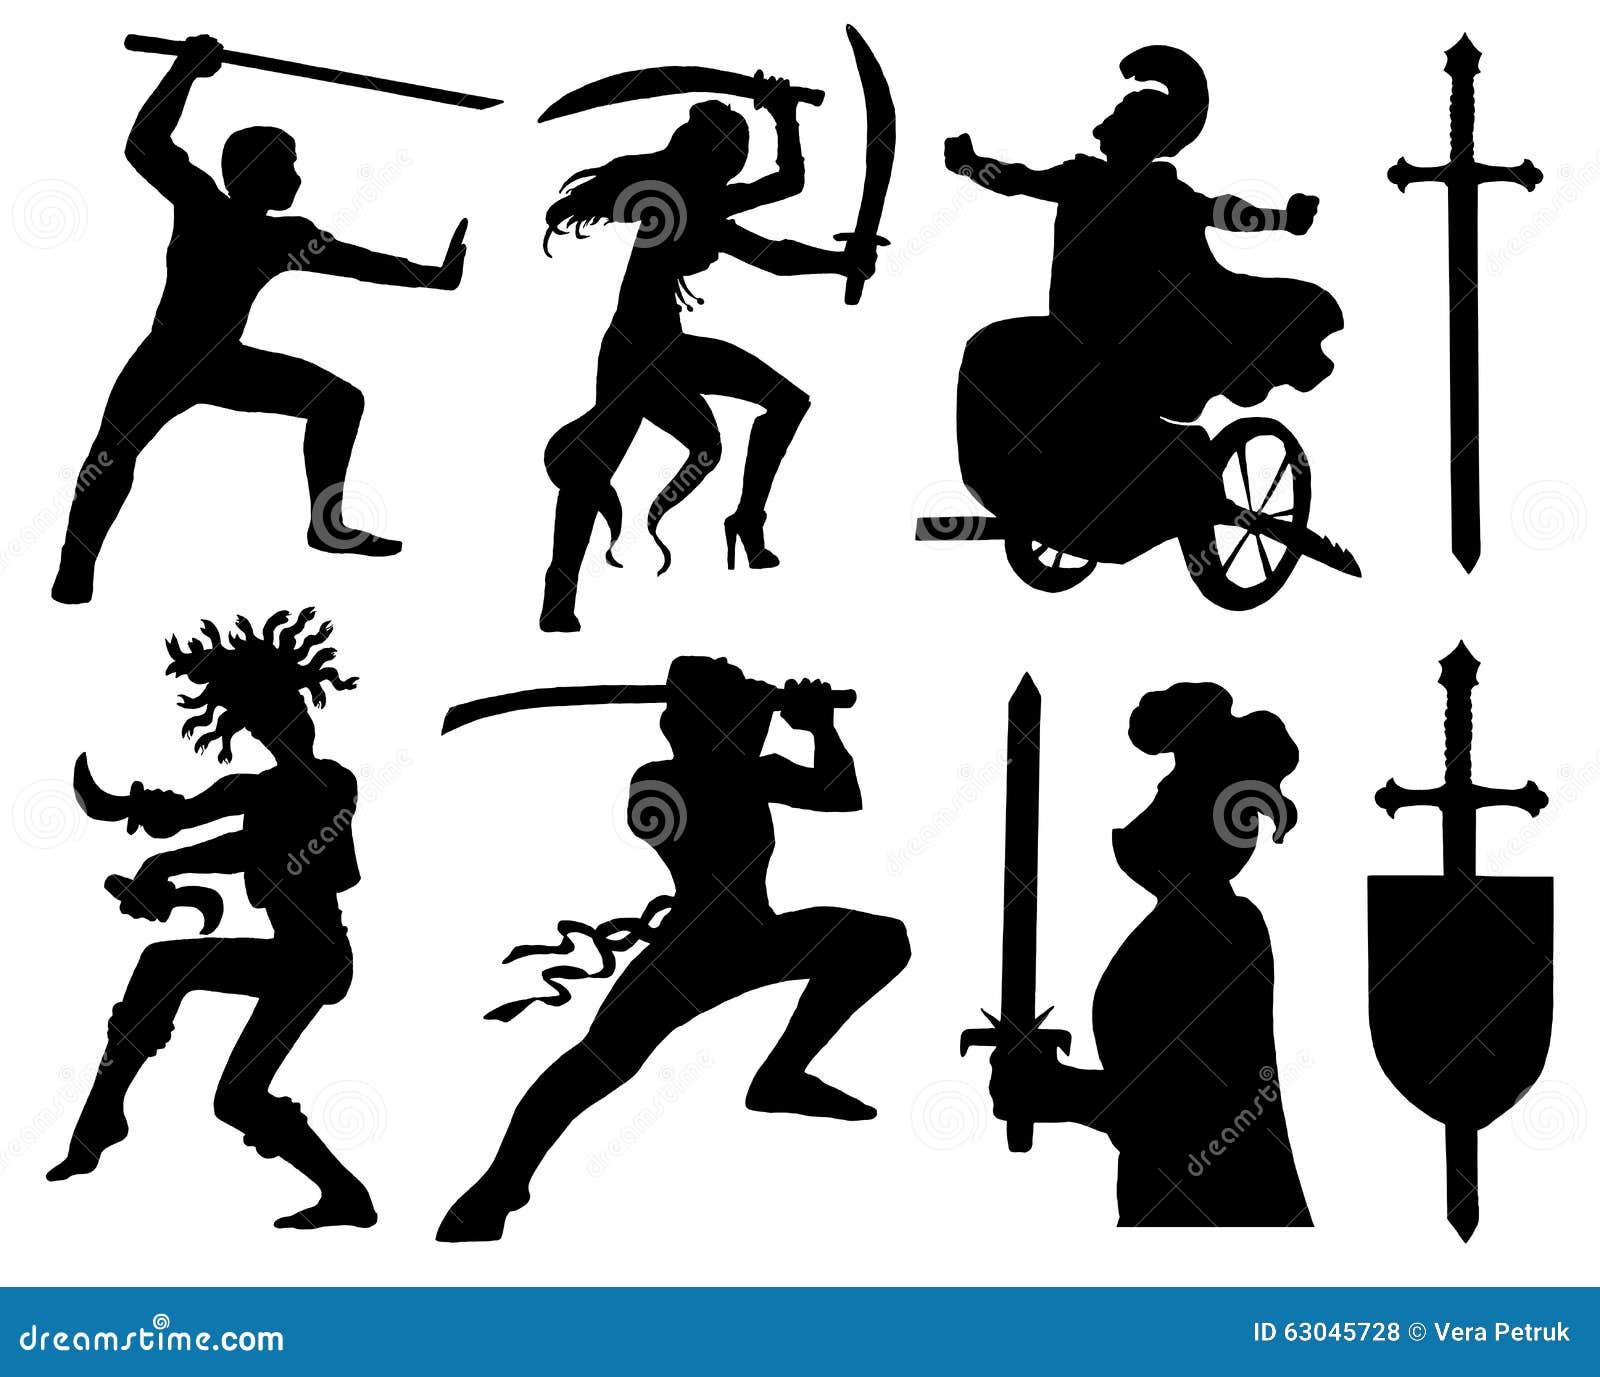 Design set with symbols of warriors stock vector illustration of design set with symbols of warriors biocorpaavc Gallery